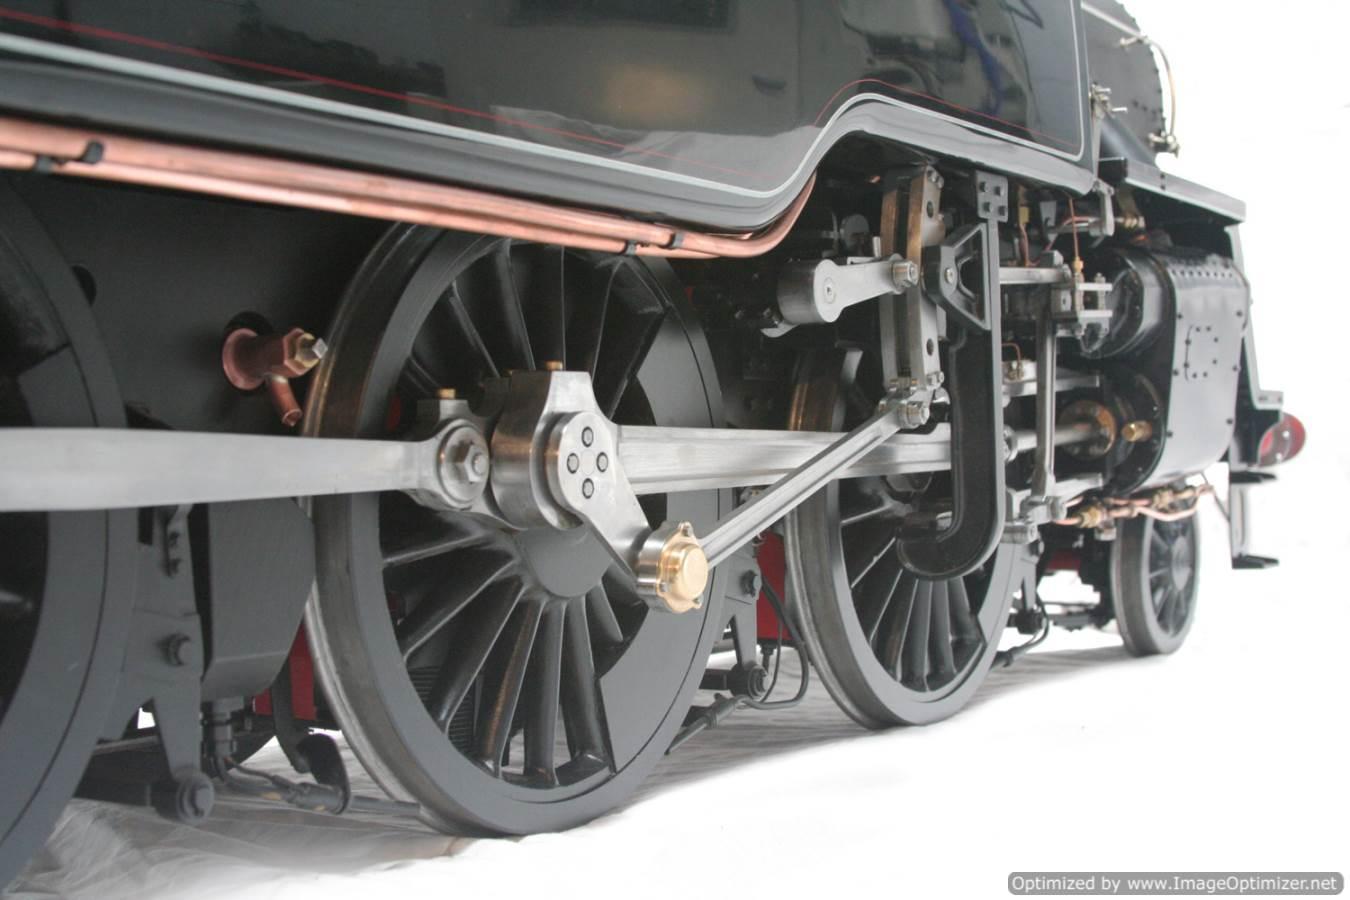 test br-standard-class-4-tank-live-steam-model-steam-workshop-rebuild-32-optimized